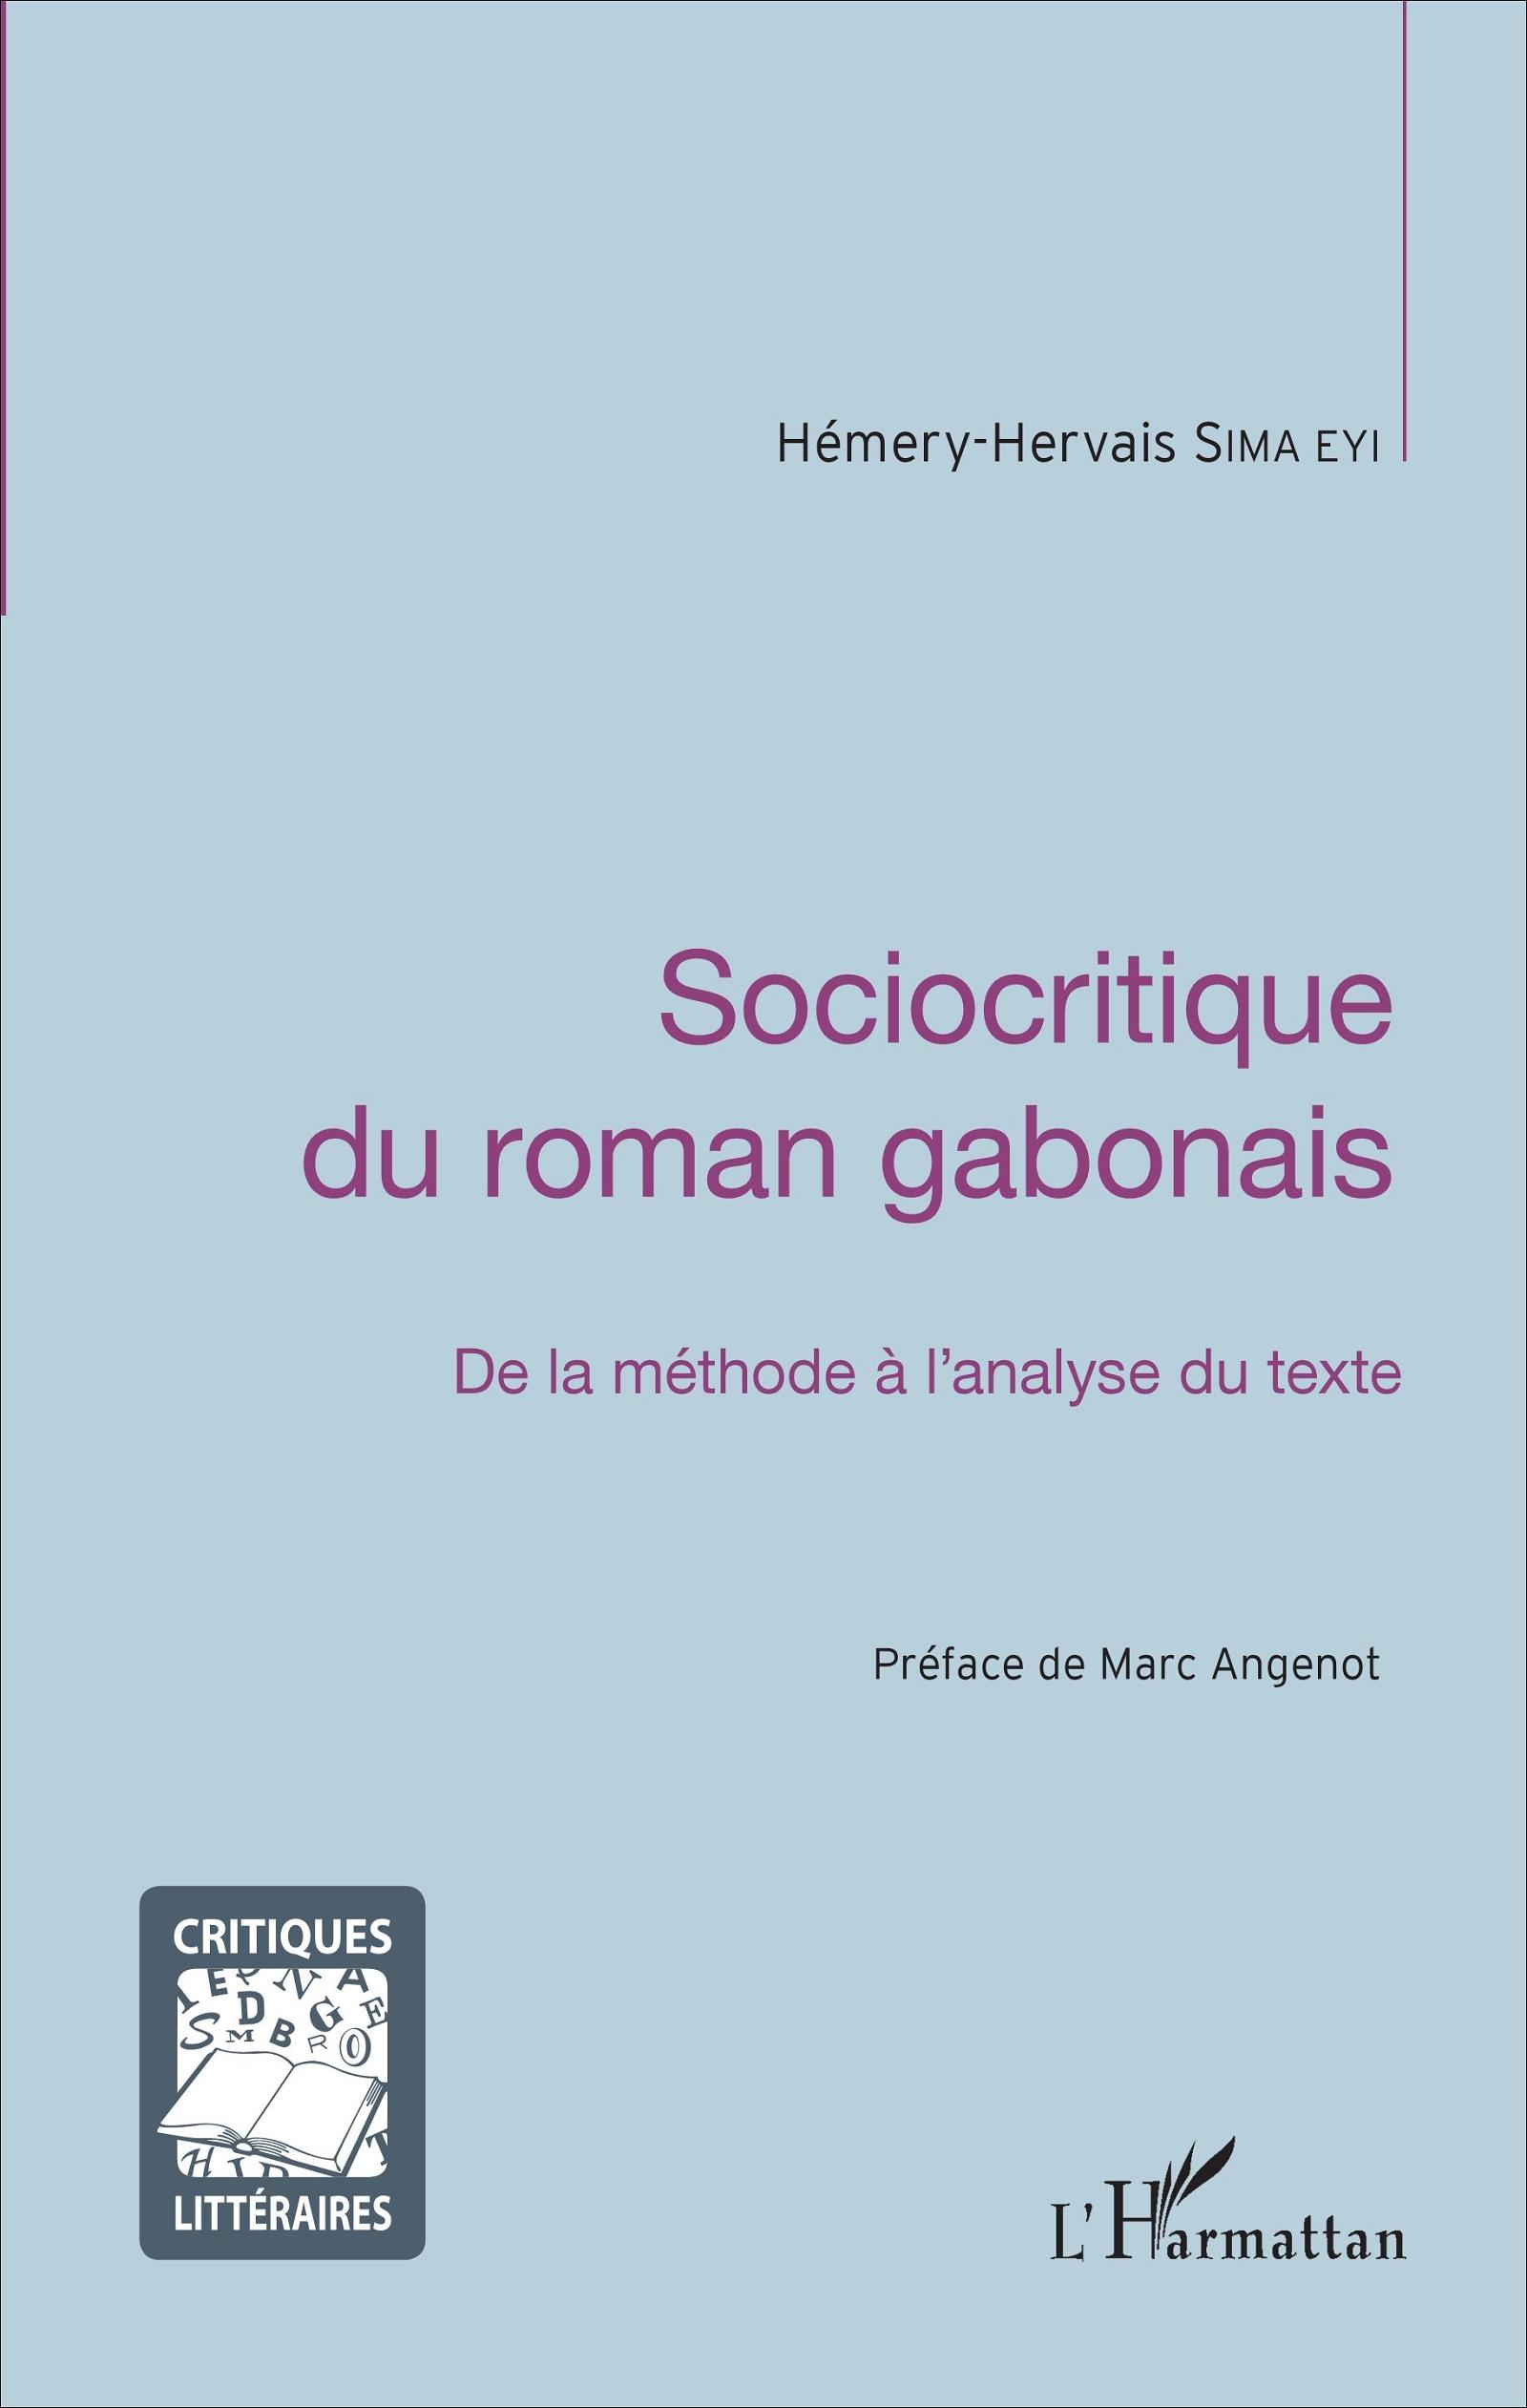 H.-H. Sima Eyi, Sociocritique du roman gabonais